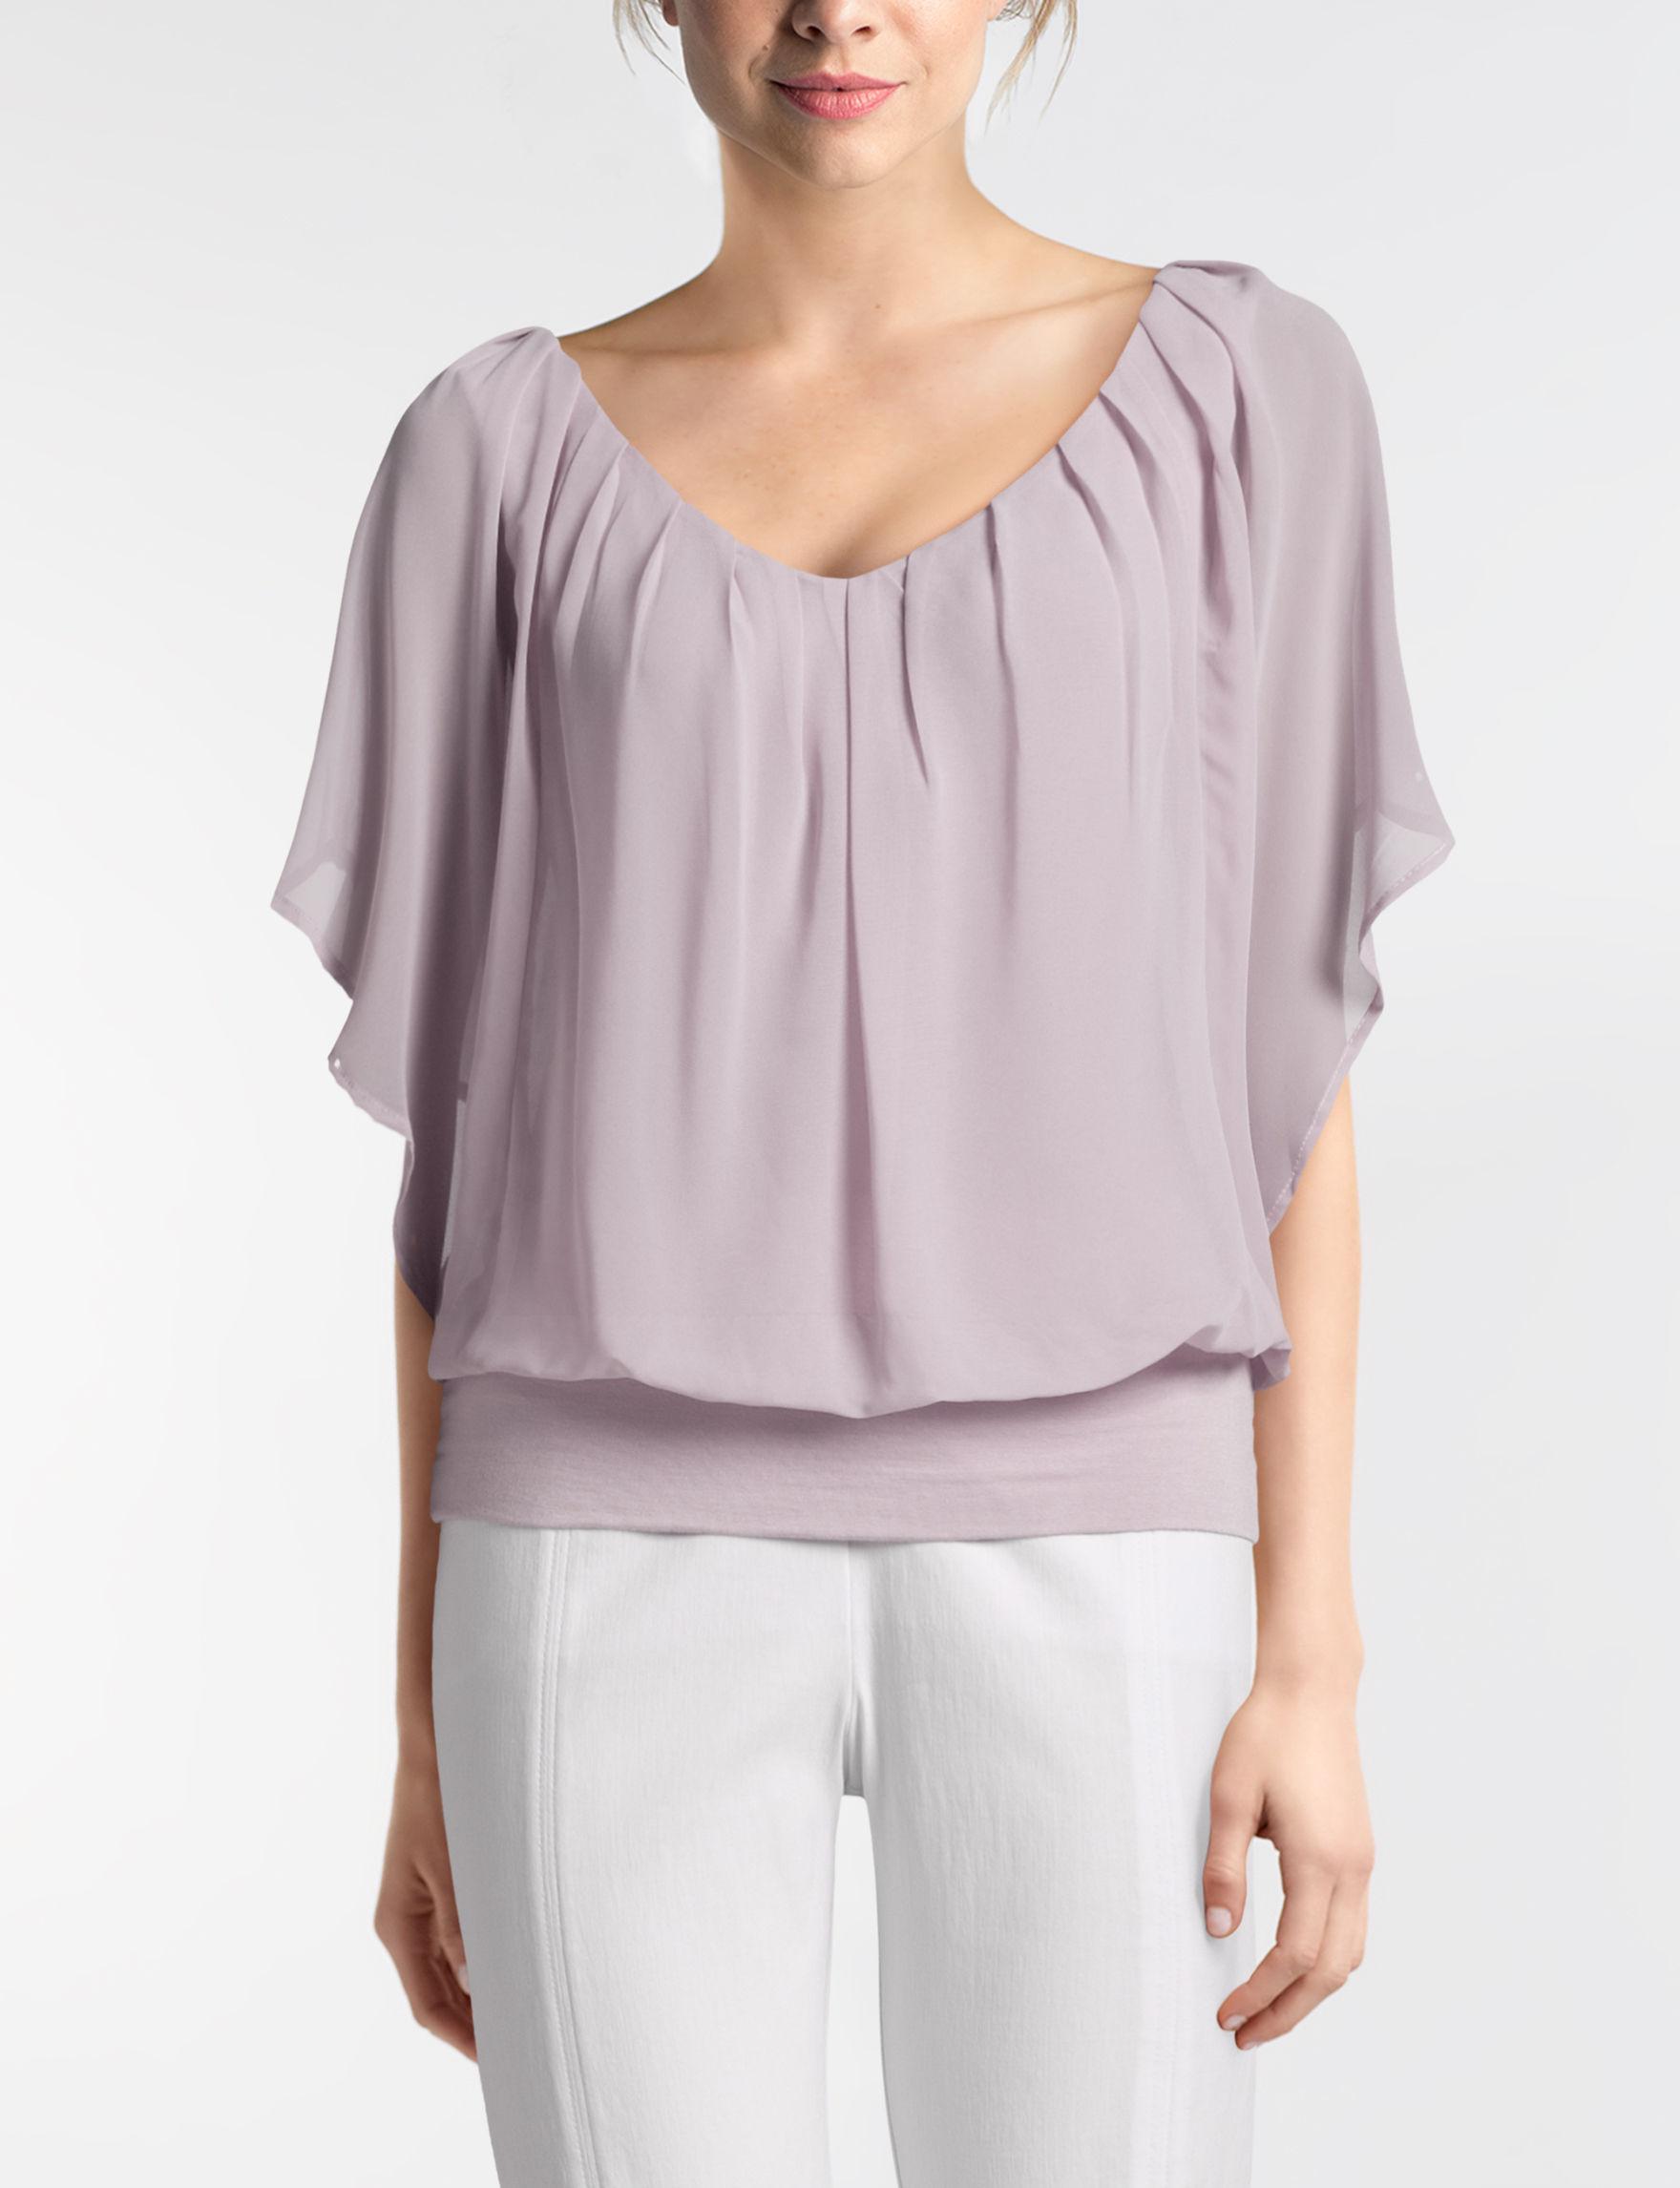 Joseph A Grey Shirts & Blouses